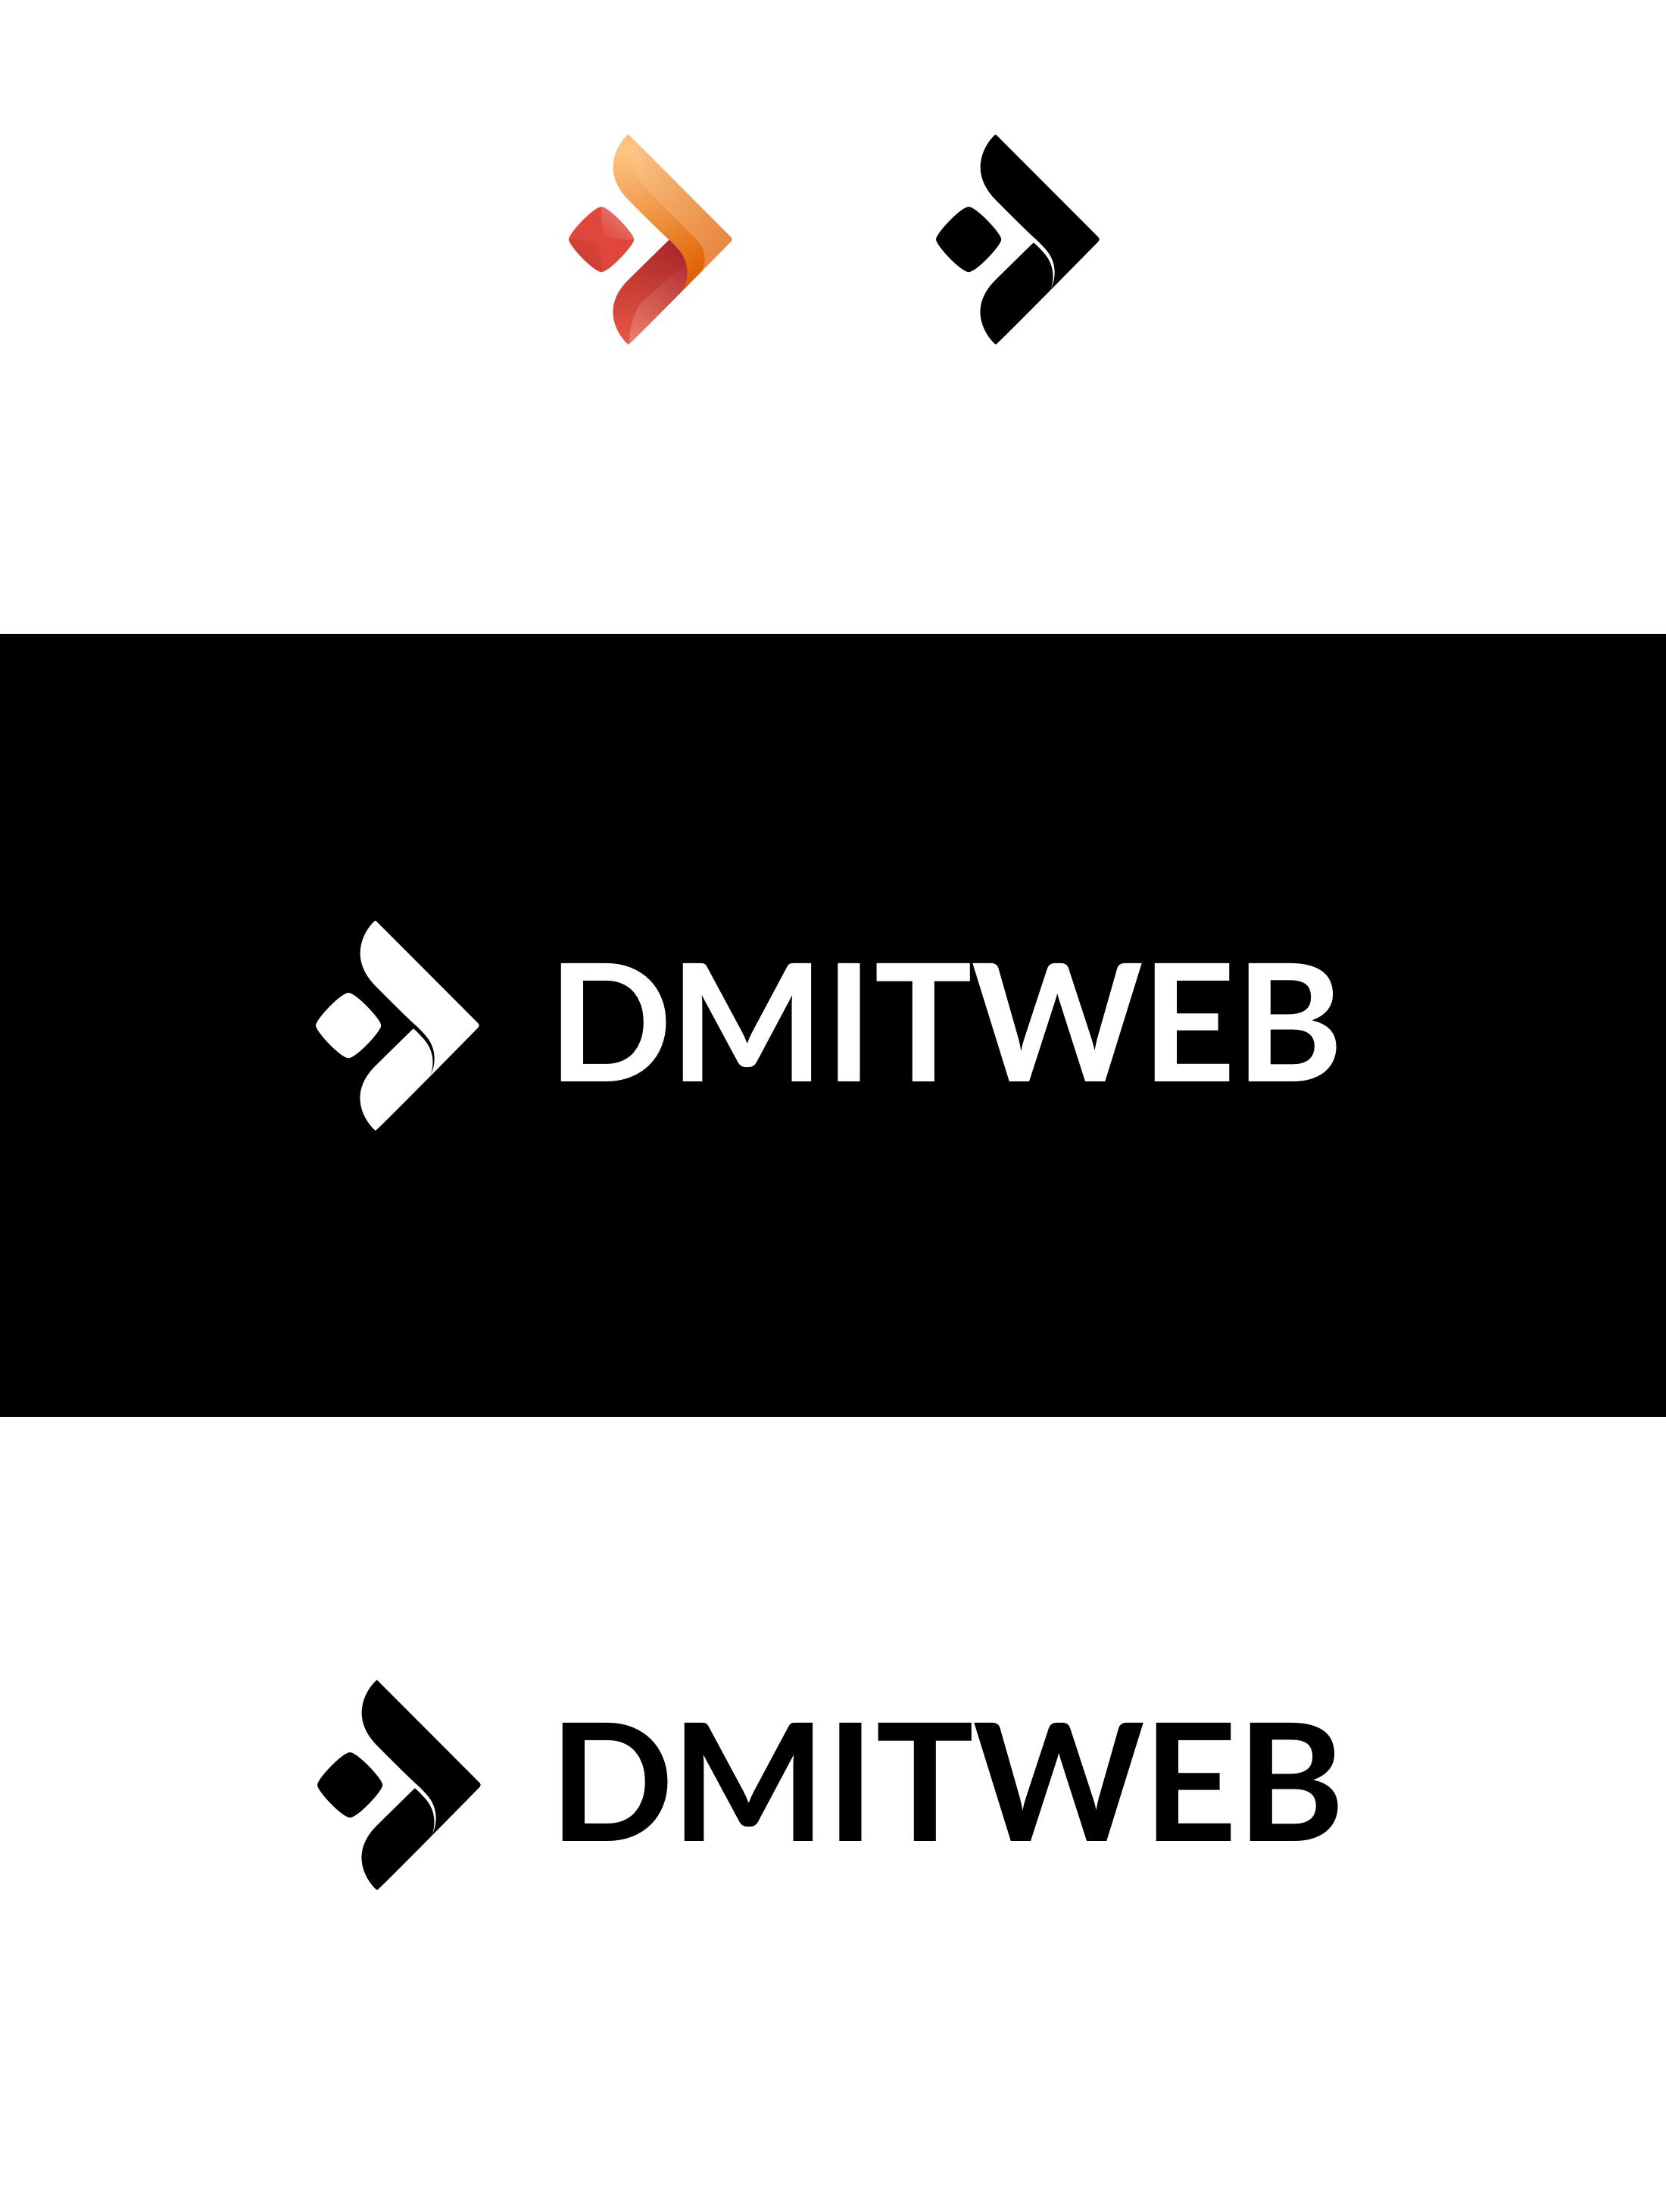 Логотип DMITWEB